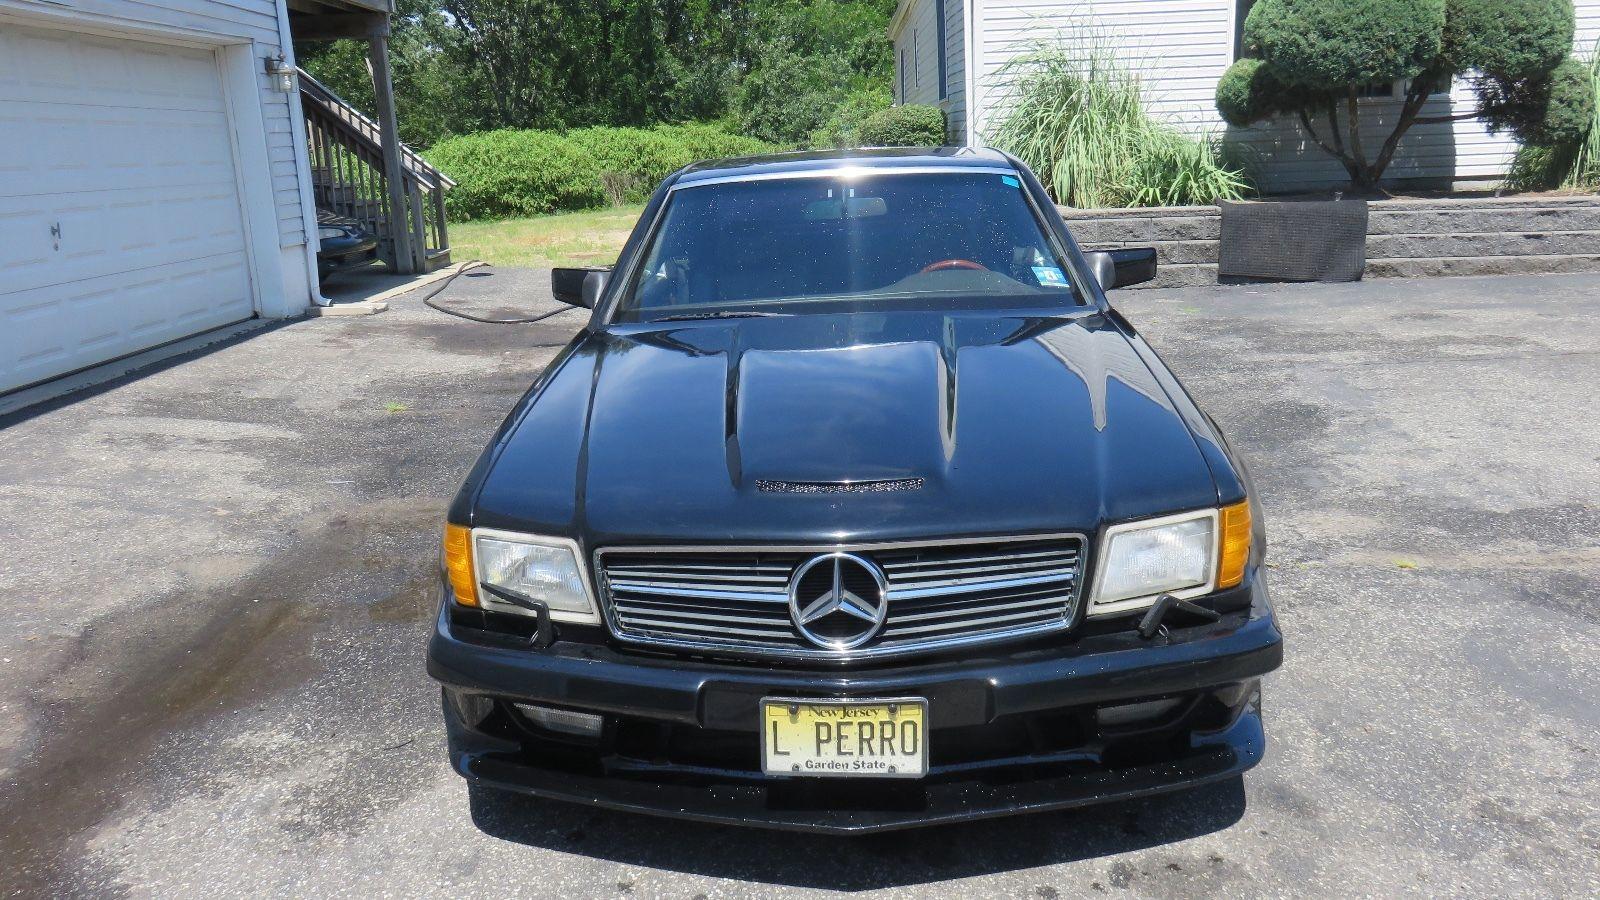 Daily Turismo: Auction Watch: 1987 Mercedes 560 SEC Koenig